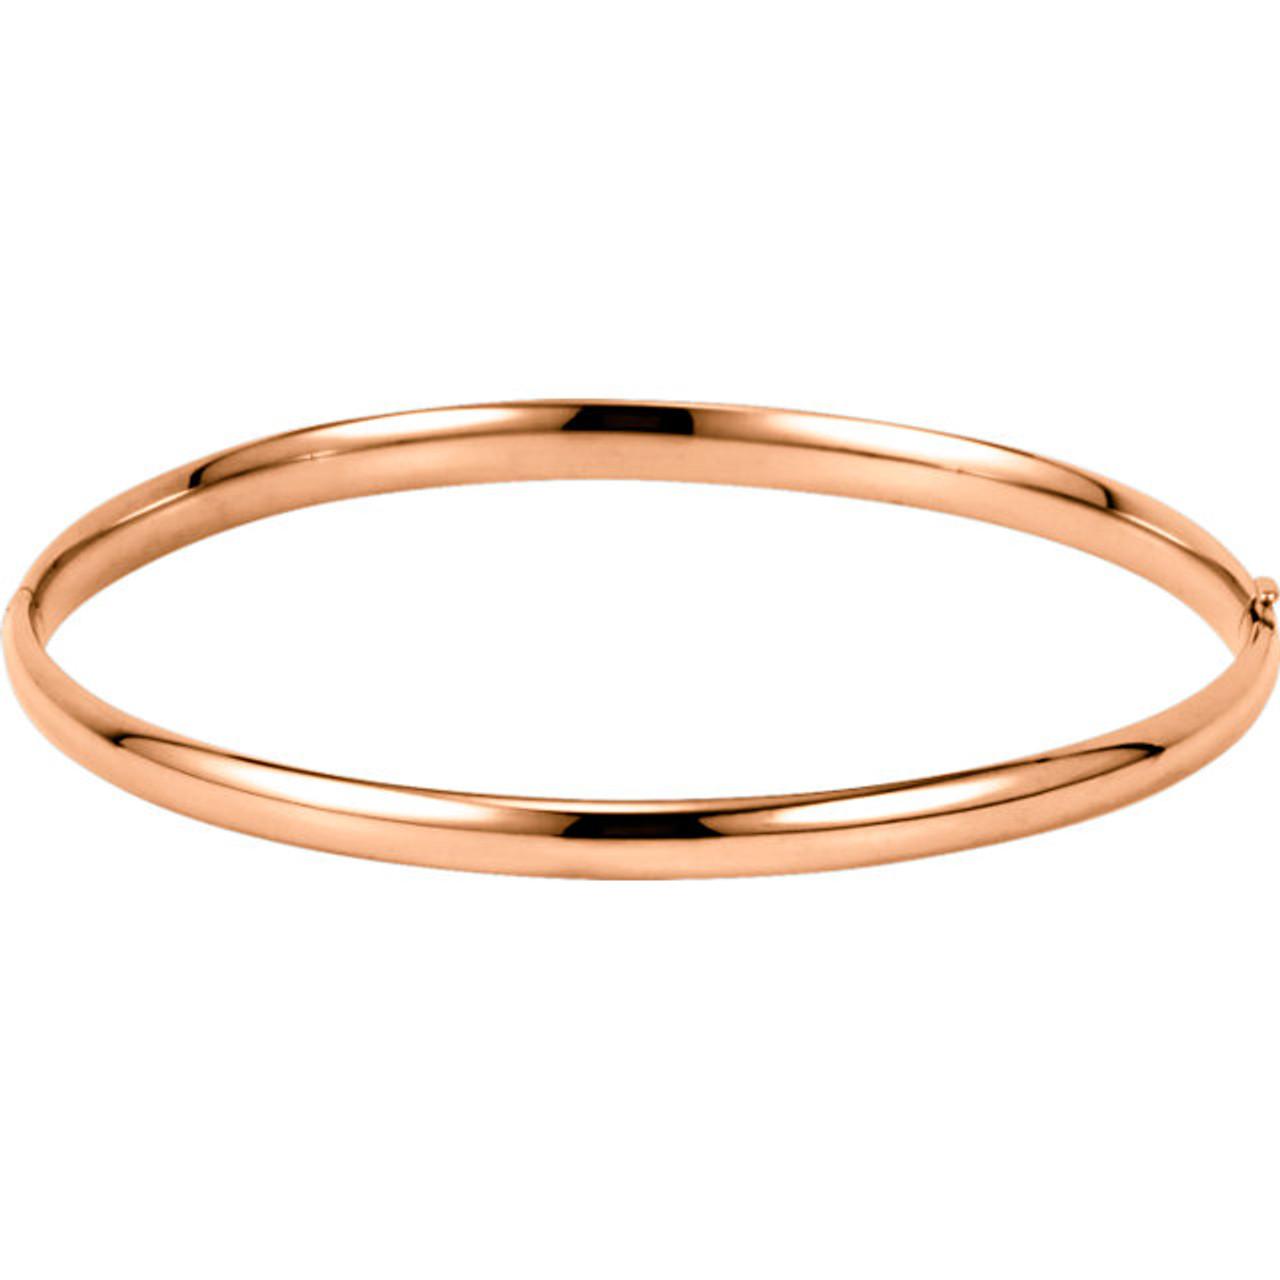 2a57636b4f8 14kt Gold Plain Hollow Hinged Bangle Bracelet - Wedding Bands & Co.